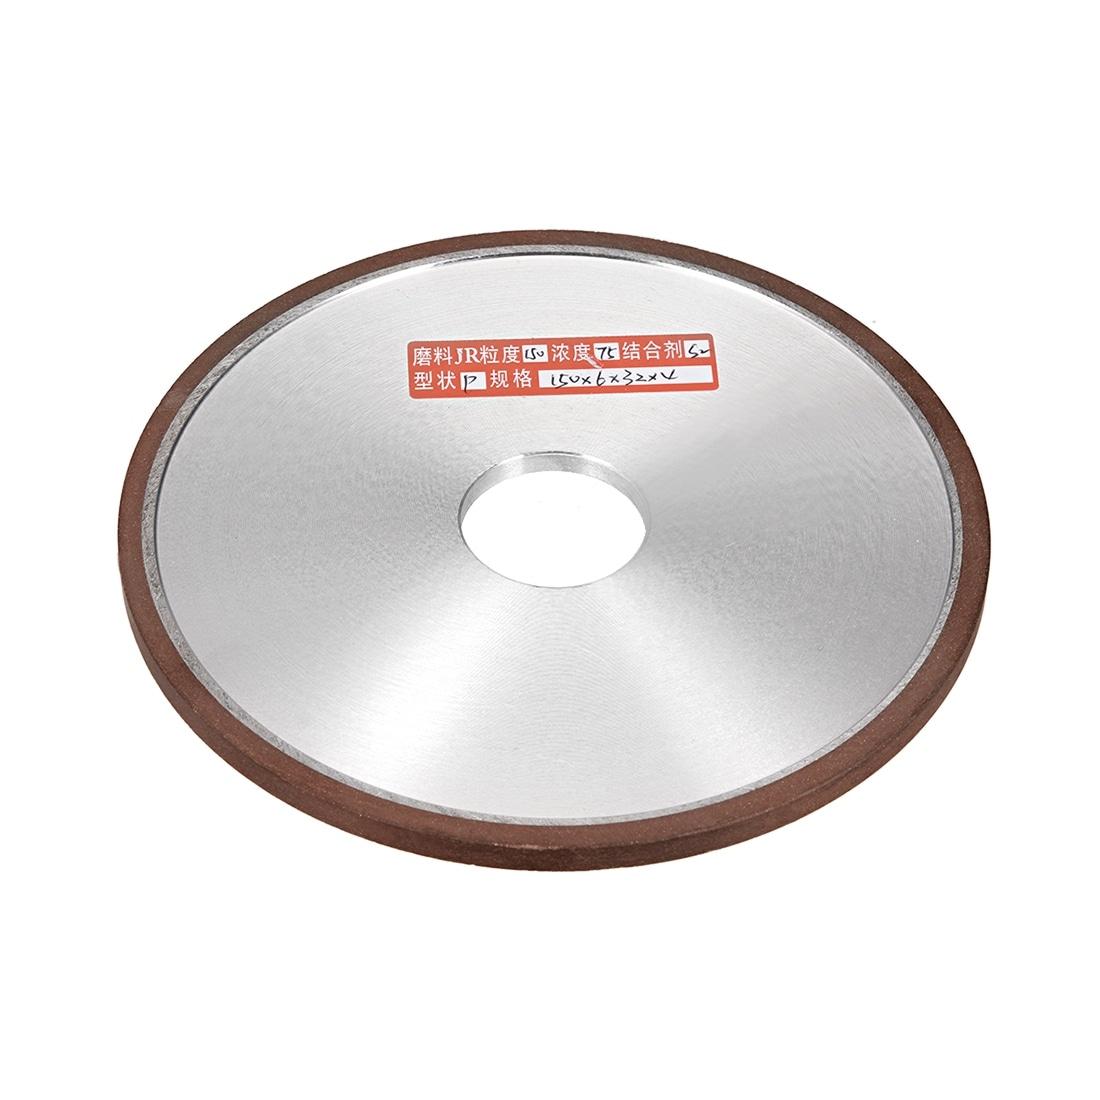 5 Inch Diamond Grinding Wheel Carbide Cutter Metal Grinder Disc Tool 150 Grit